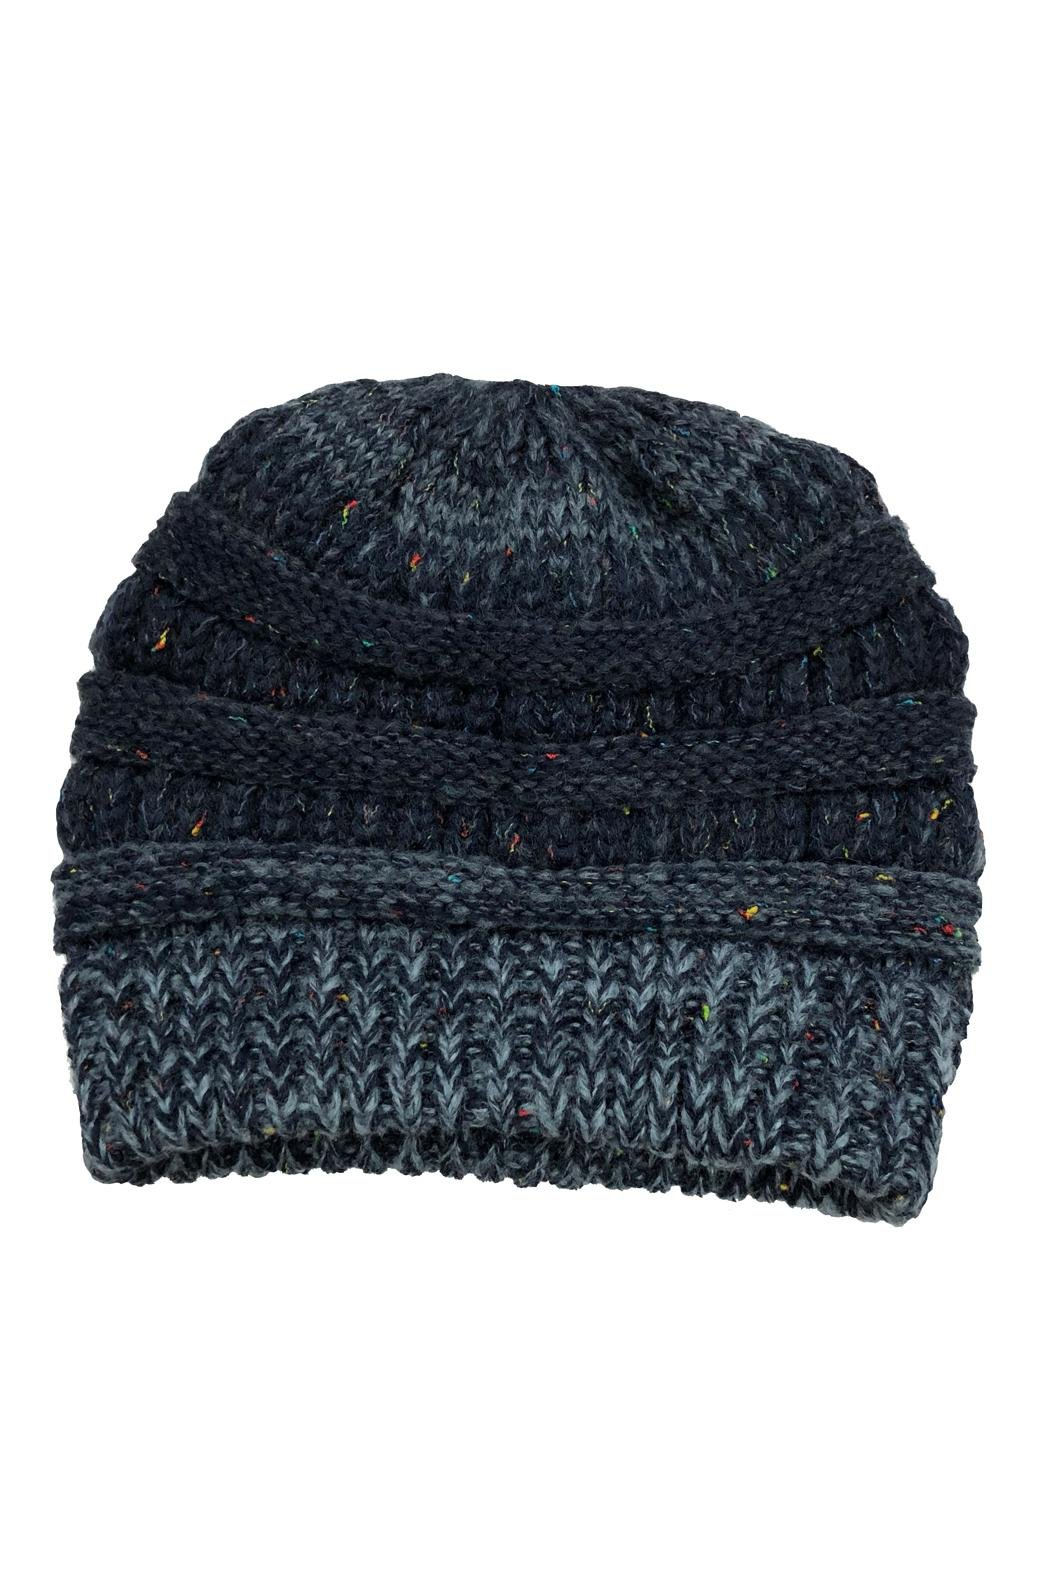 Confetti Knit Hat